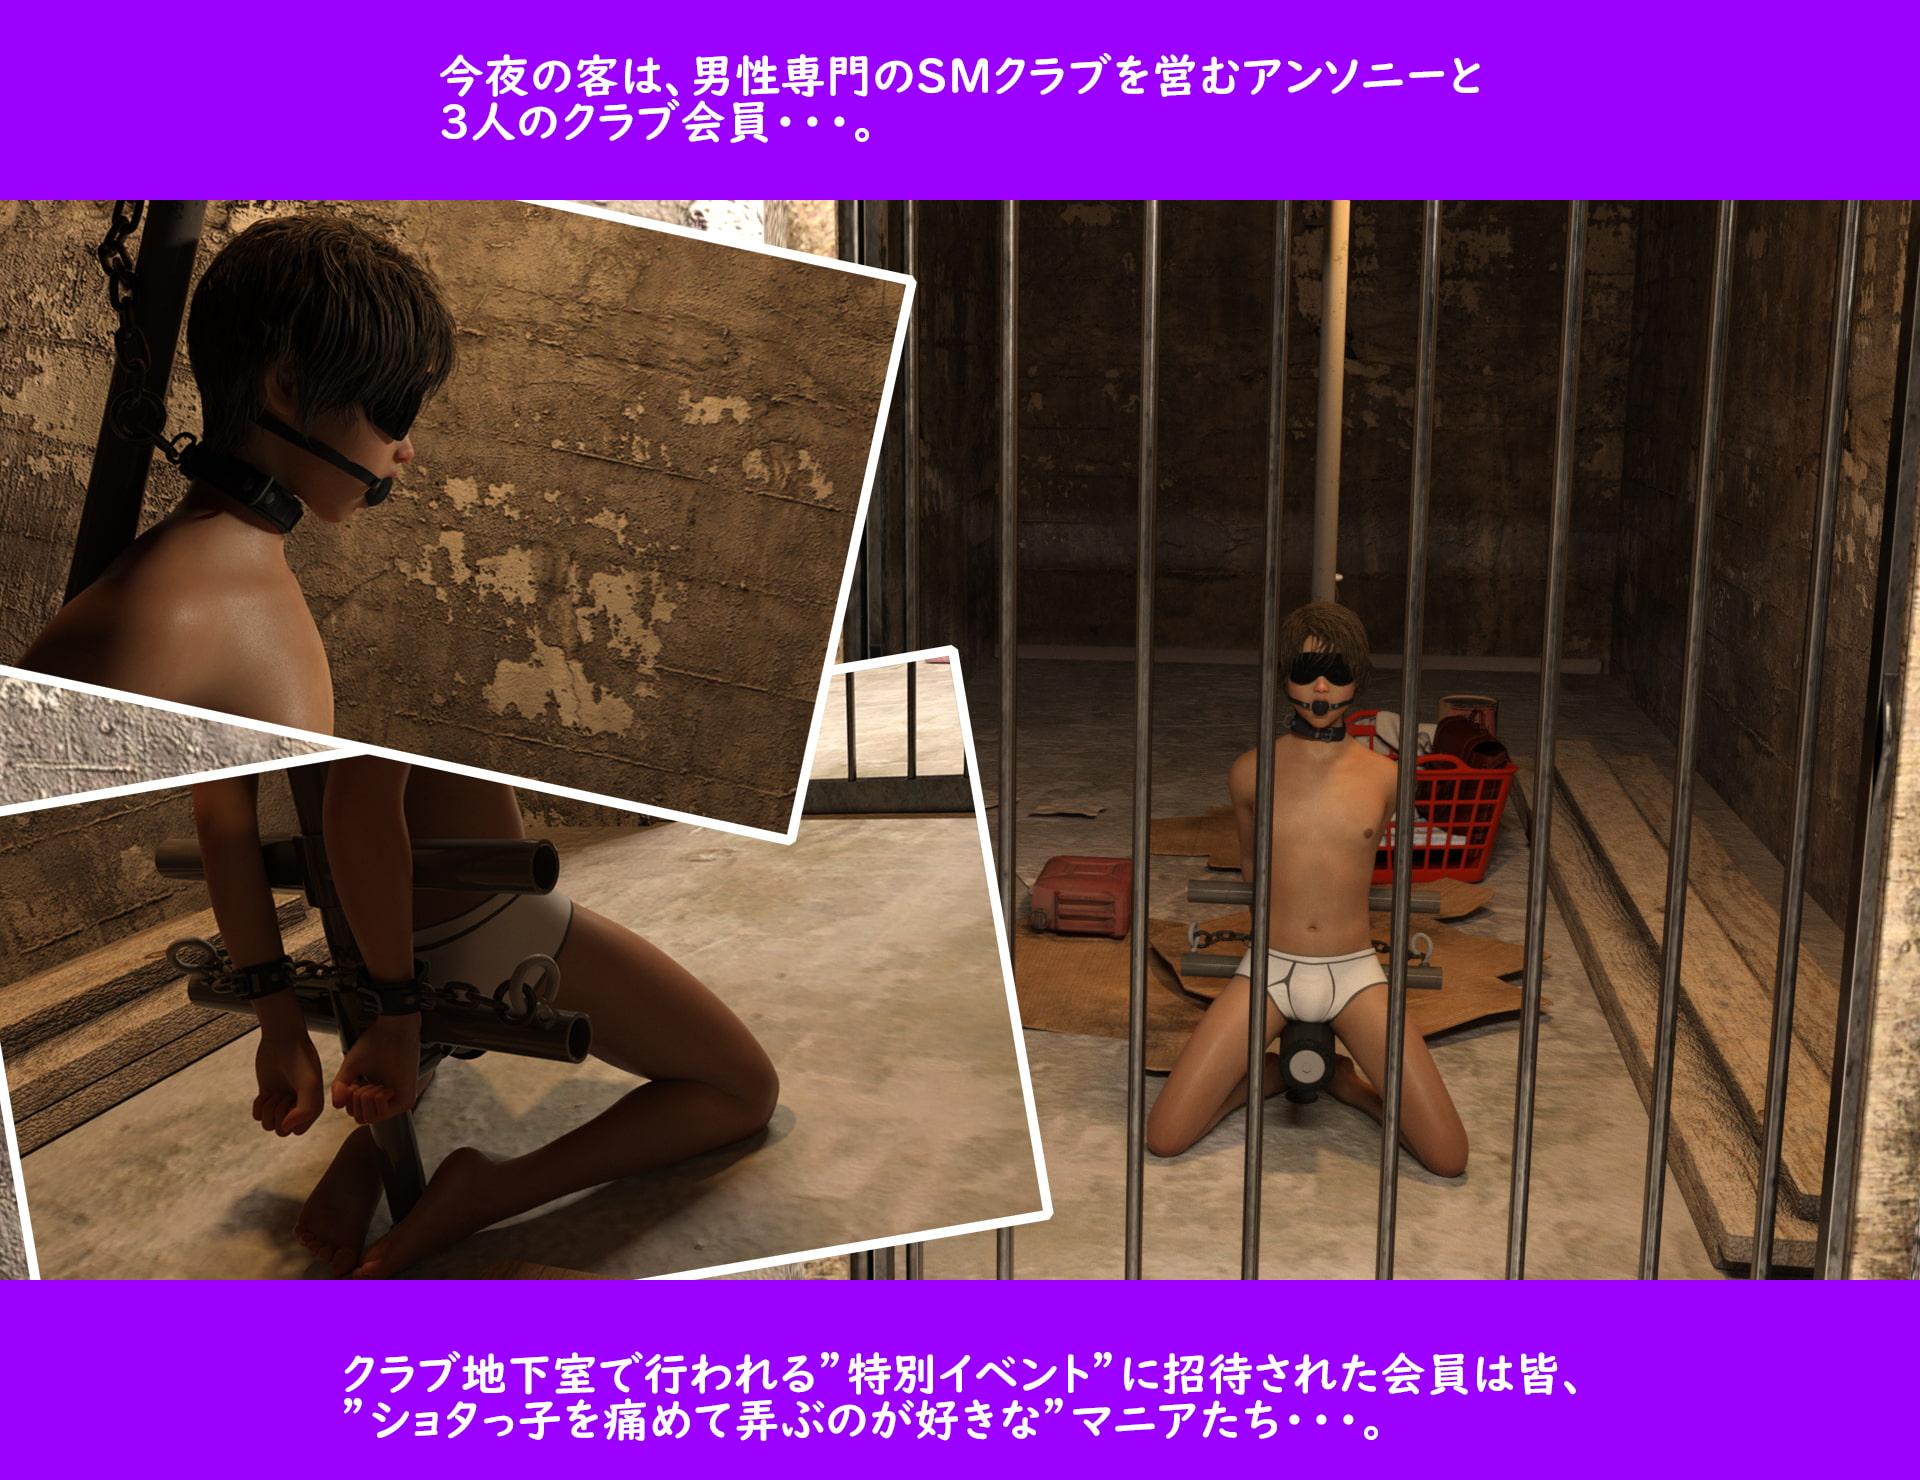 A.I.ボーイズ・ザ・シチュエーションズ -#001 BDSMクラブ(地下室)-